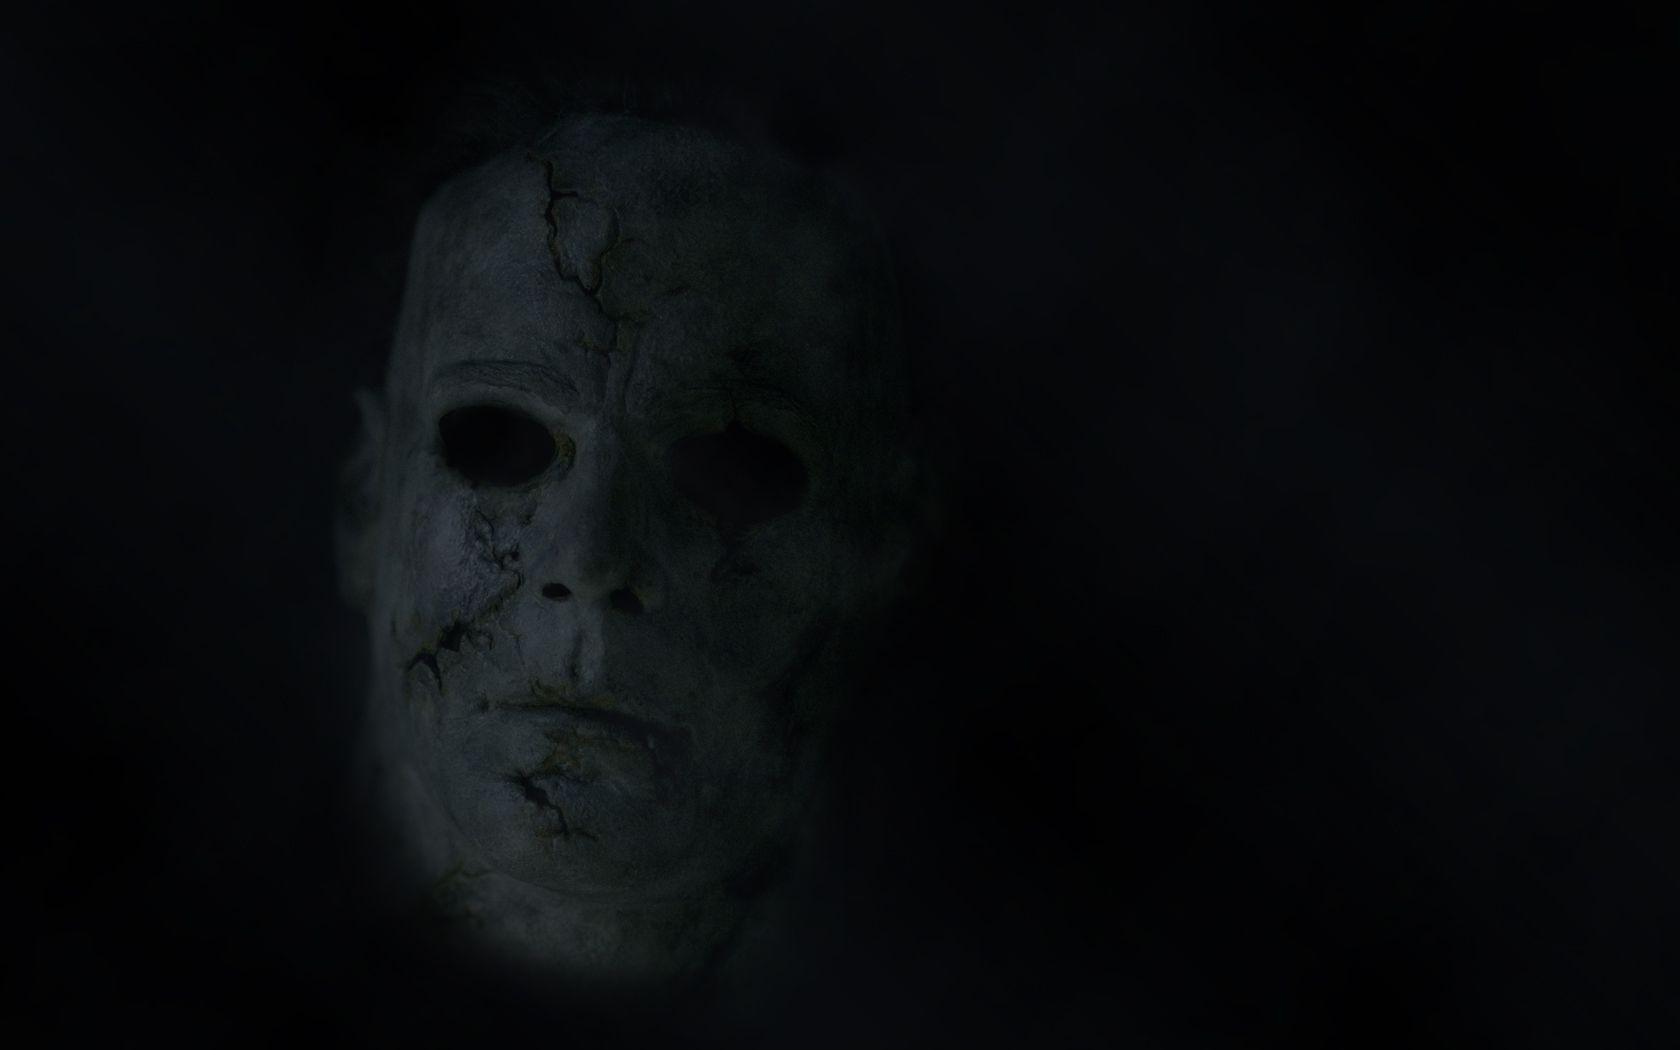 Evil Horror Wallpapers Top Free Evil Horror Backgrounds